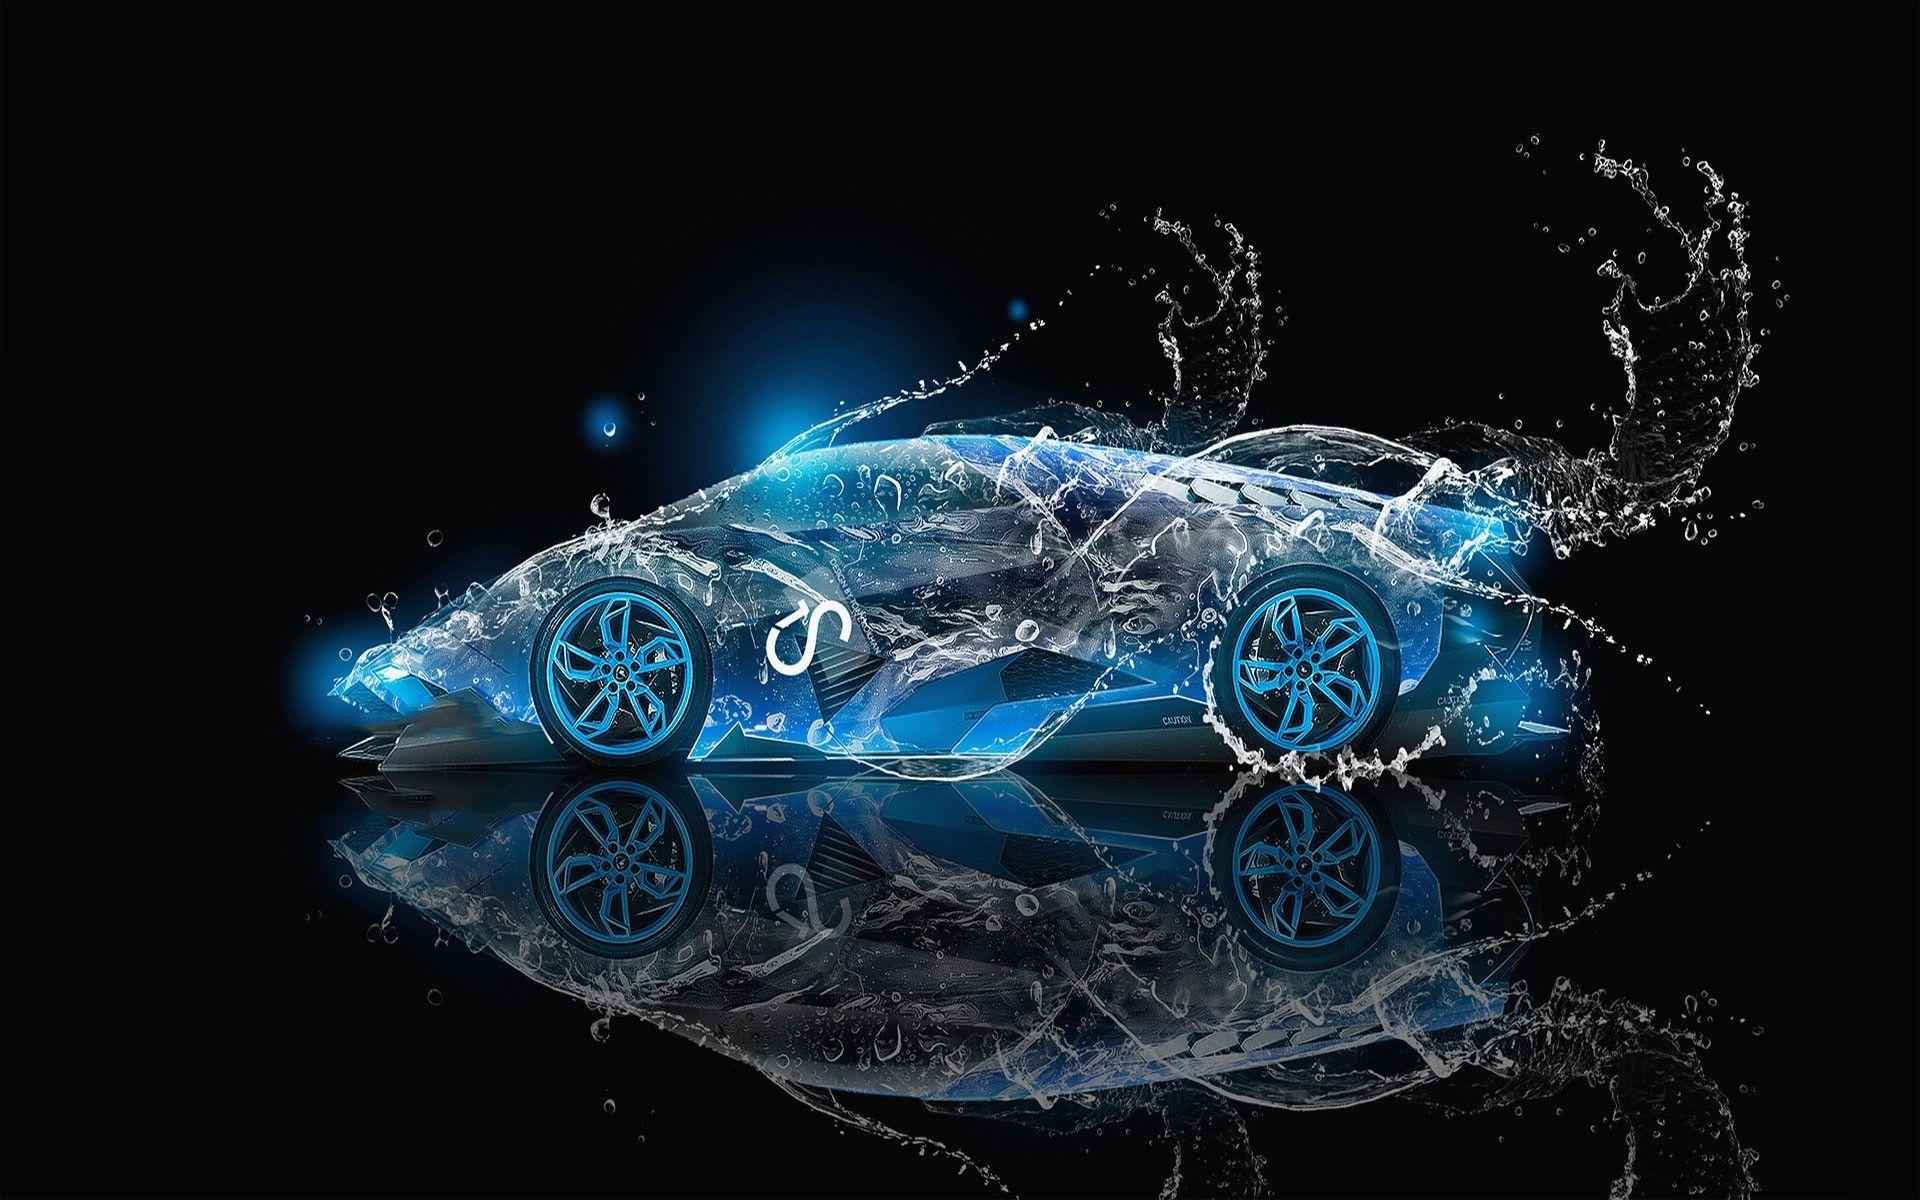 3d Car Wallpapers Top Free 3d Car Backgrounds Wallpaperaccess